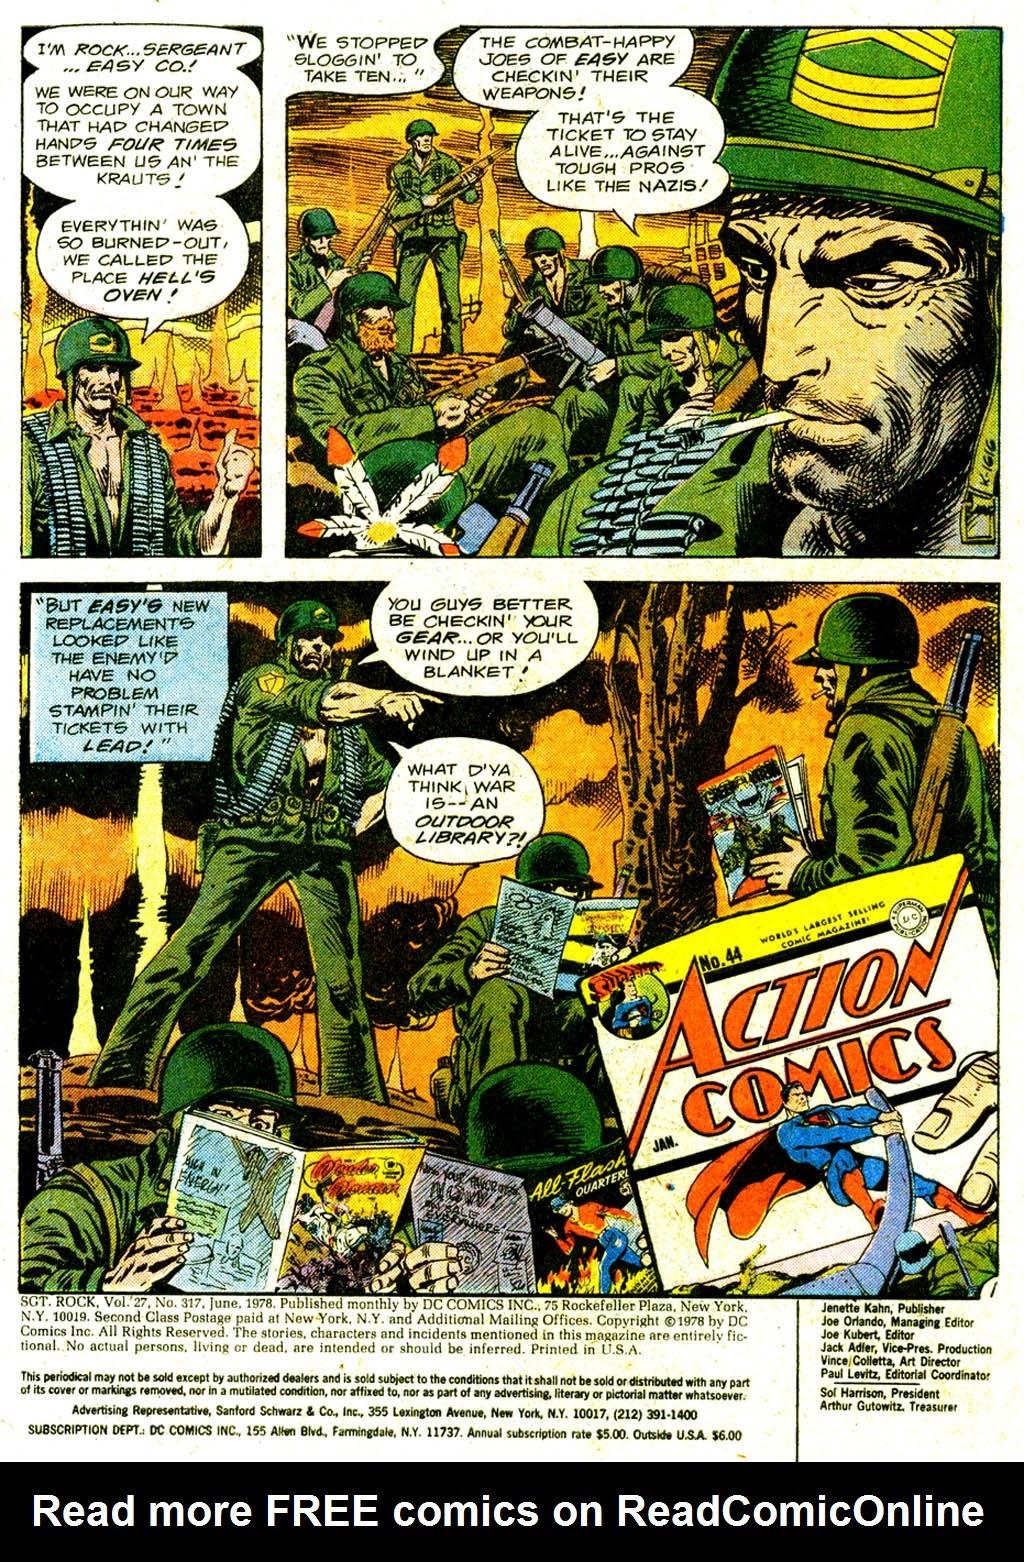 Read online Sgt. Rock comic -  Issue #317 - 3